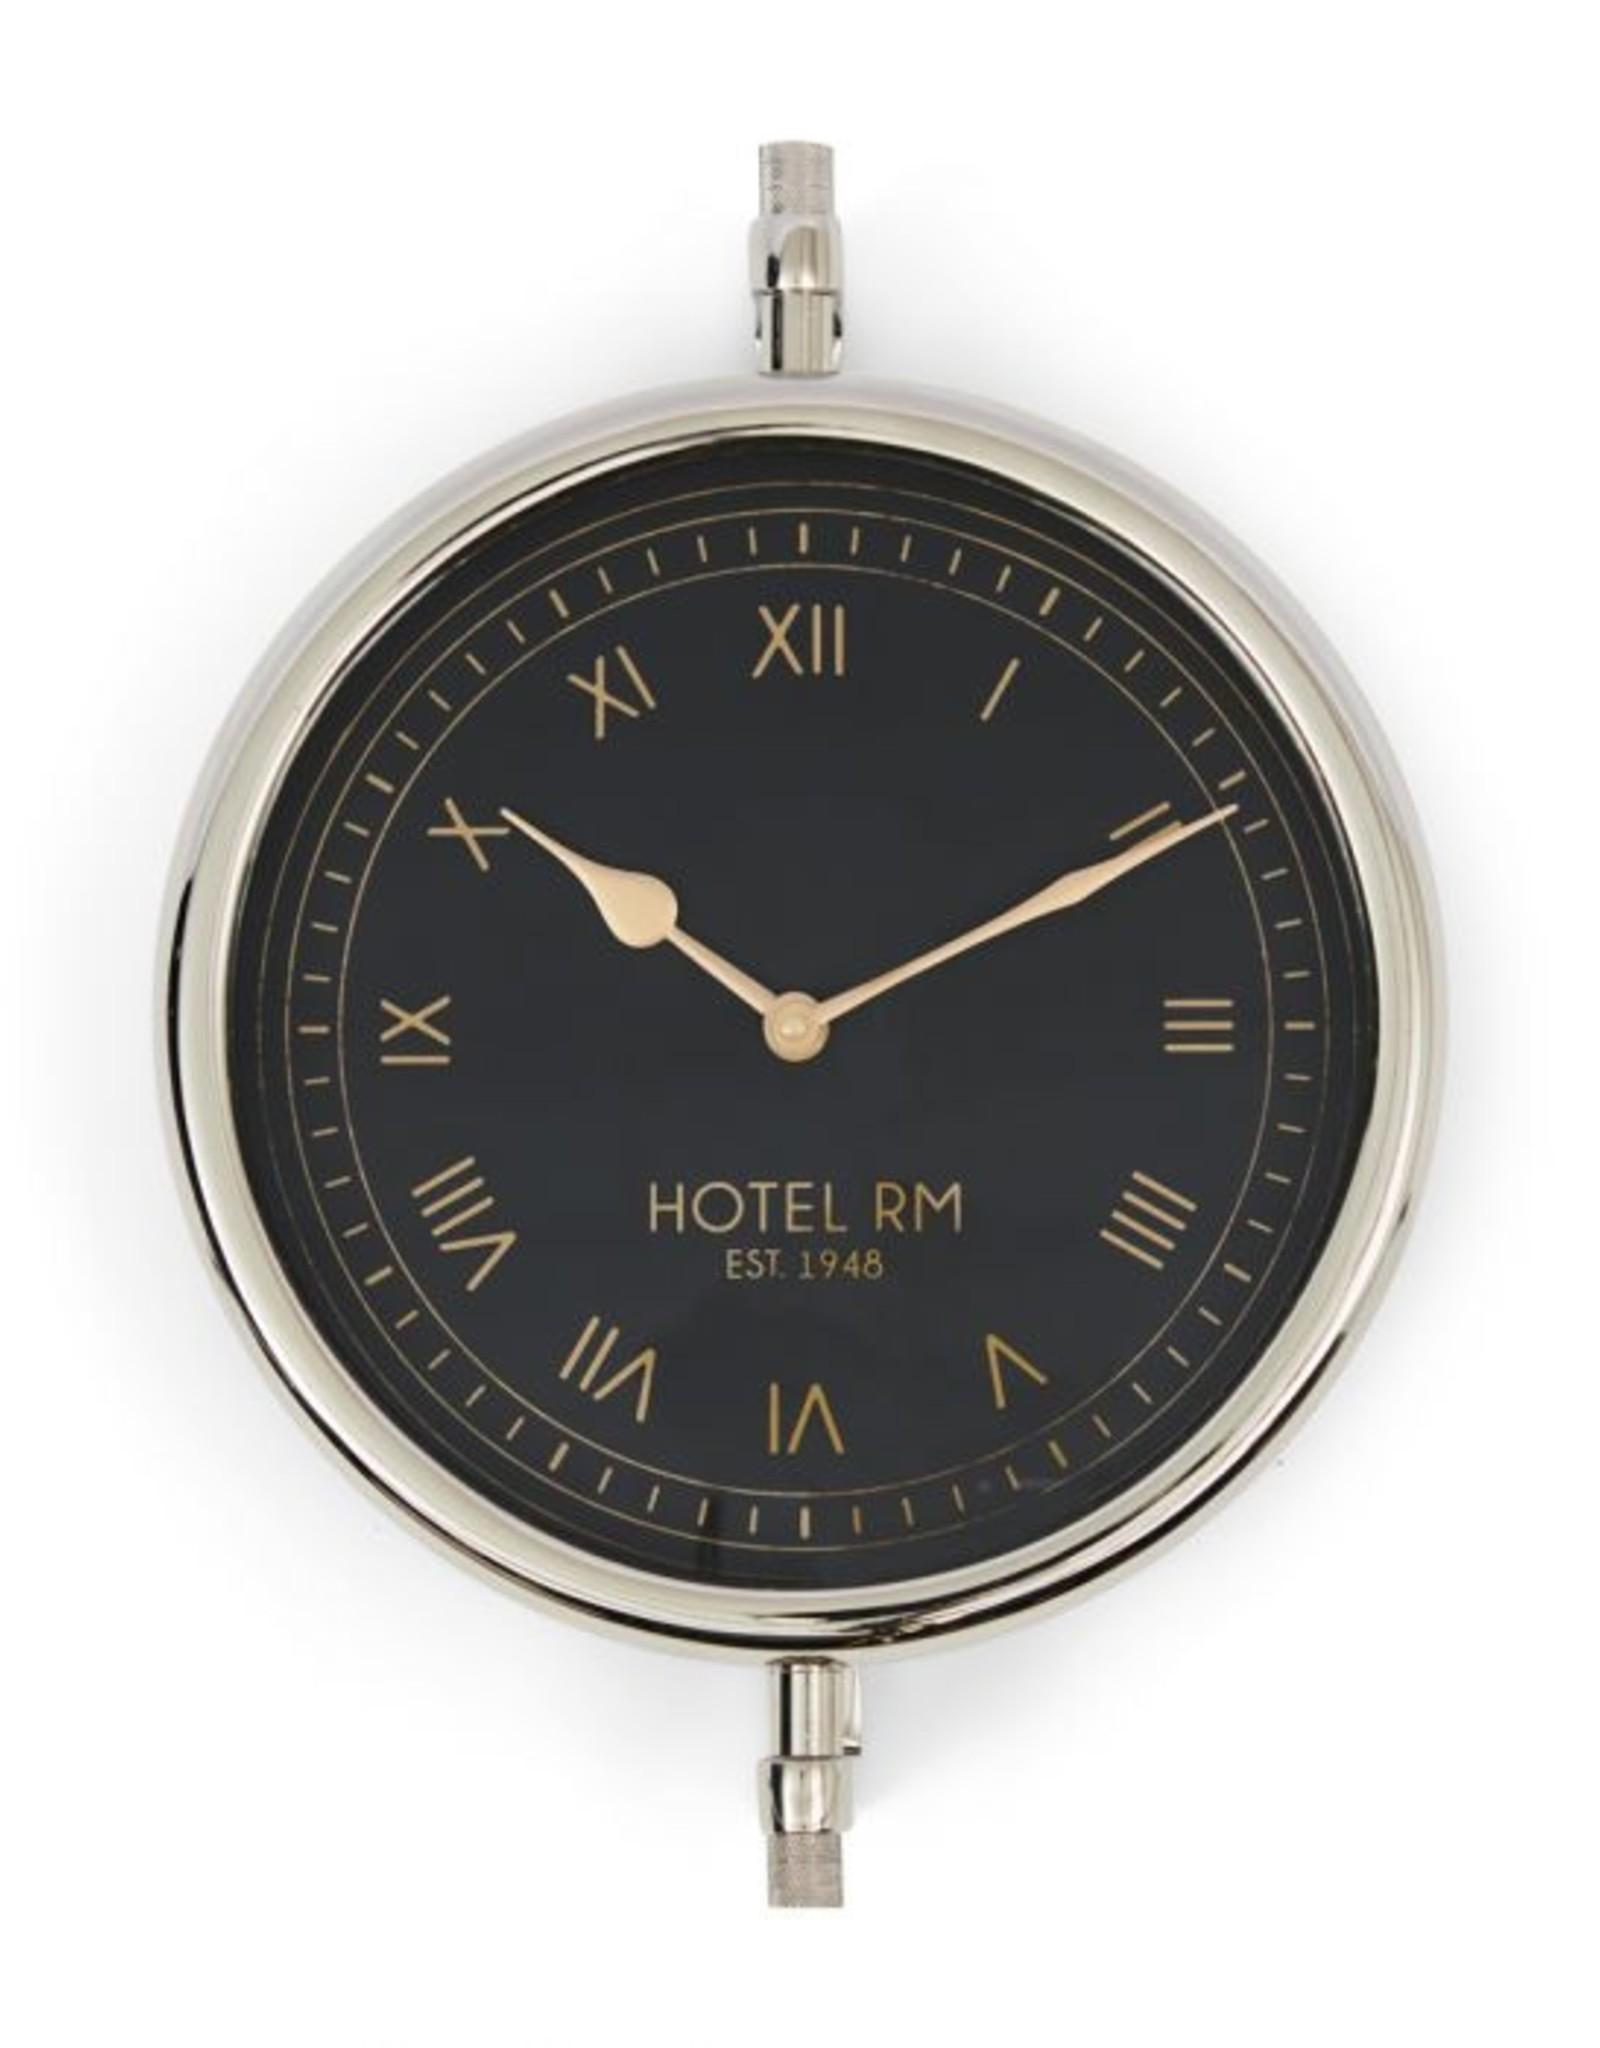 Riviera Maison RM Hotel Wall Clock